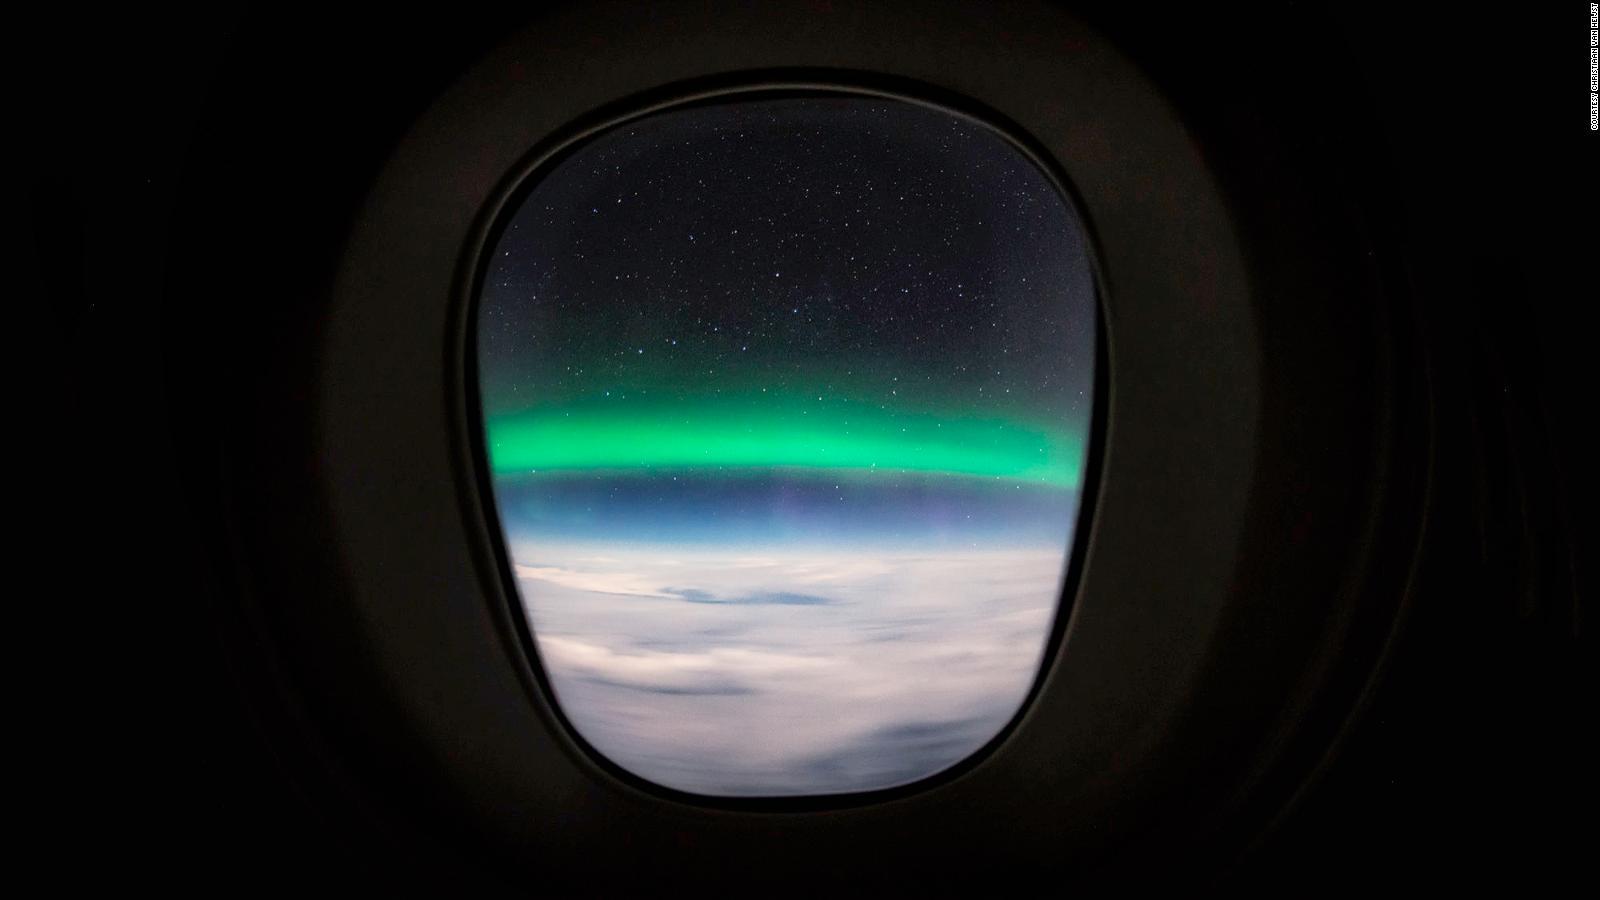 Pilot's spectacular photos taken from an airplane cockpit | CNN Travel